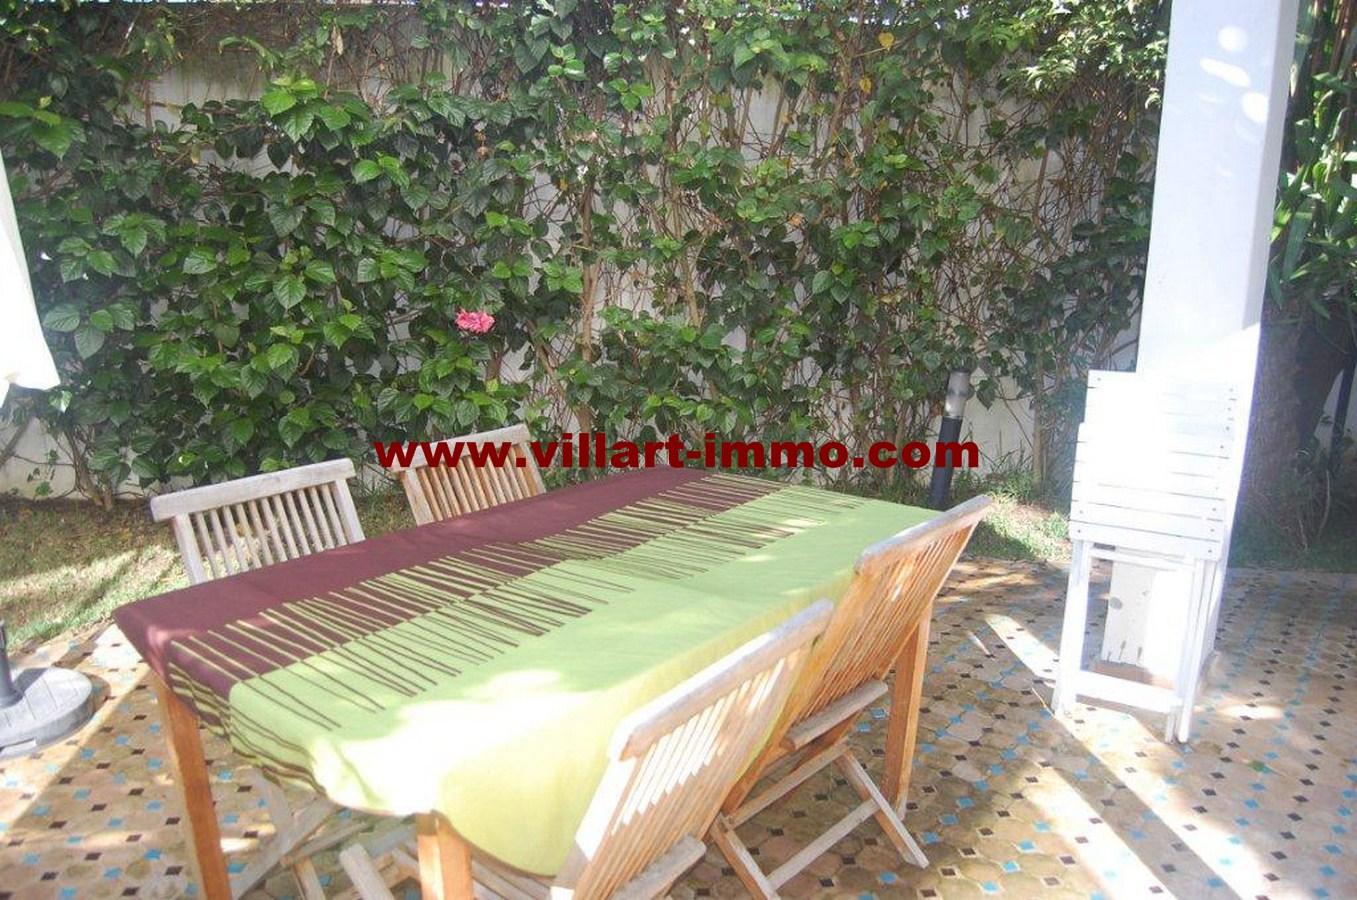 2-a-vendre-tanger-villa-californie-jardin-2-vv461-villart-immo-agence-immobiliere-copier